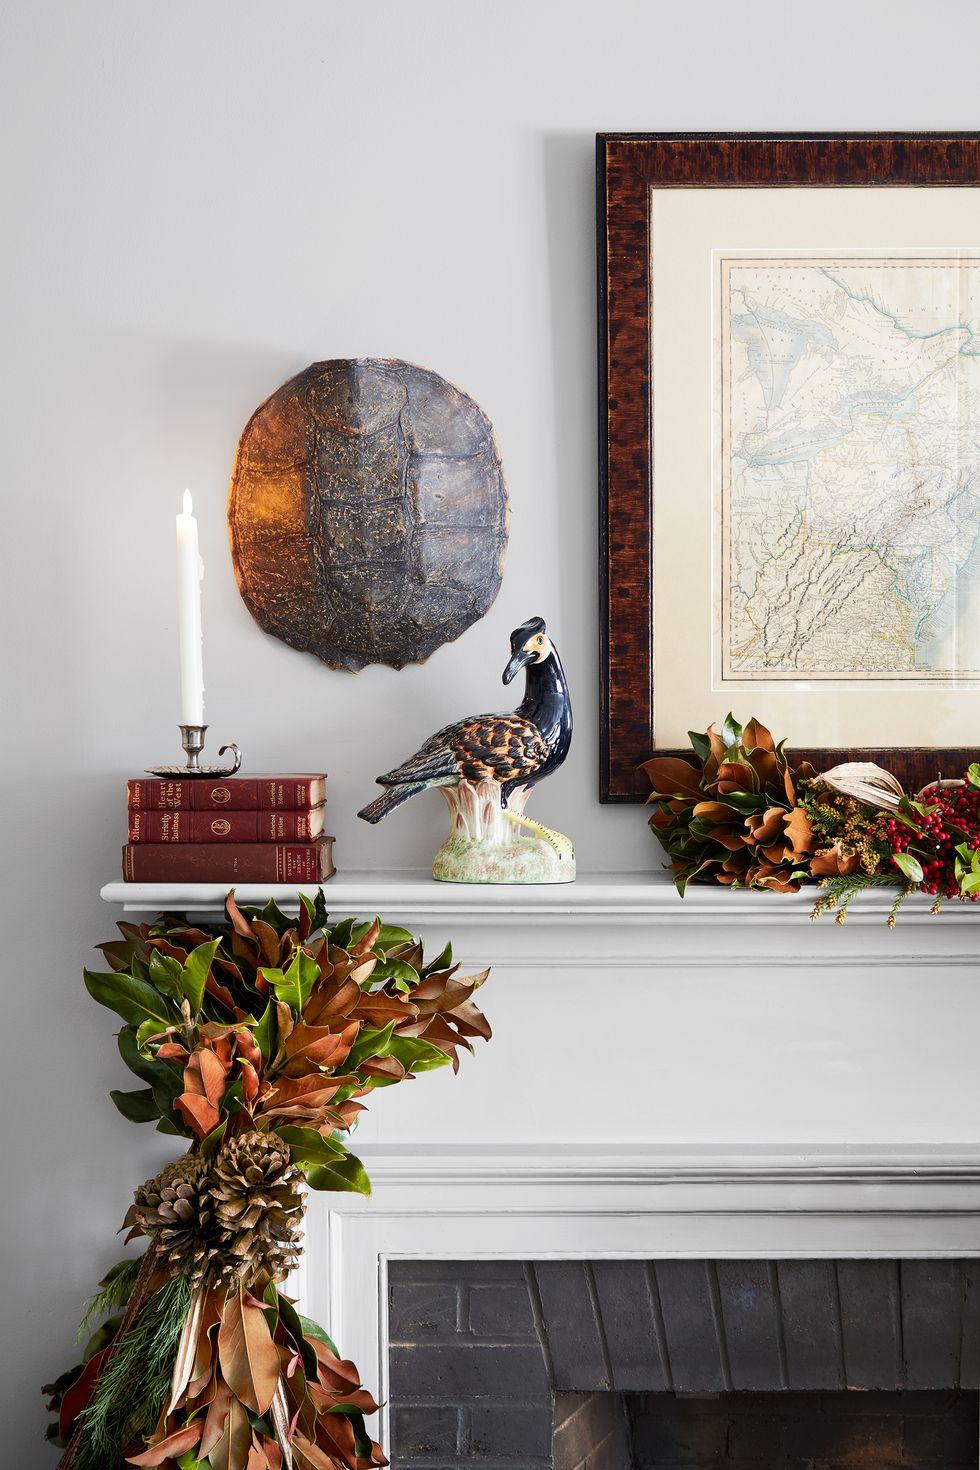 thanksgiving-decor-hbx010118wolf06-1562777476.jpg